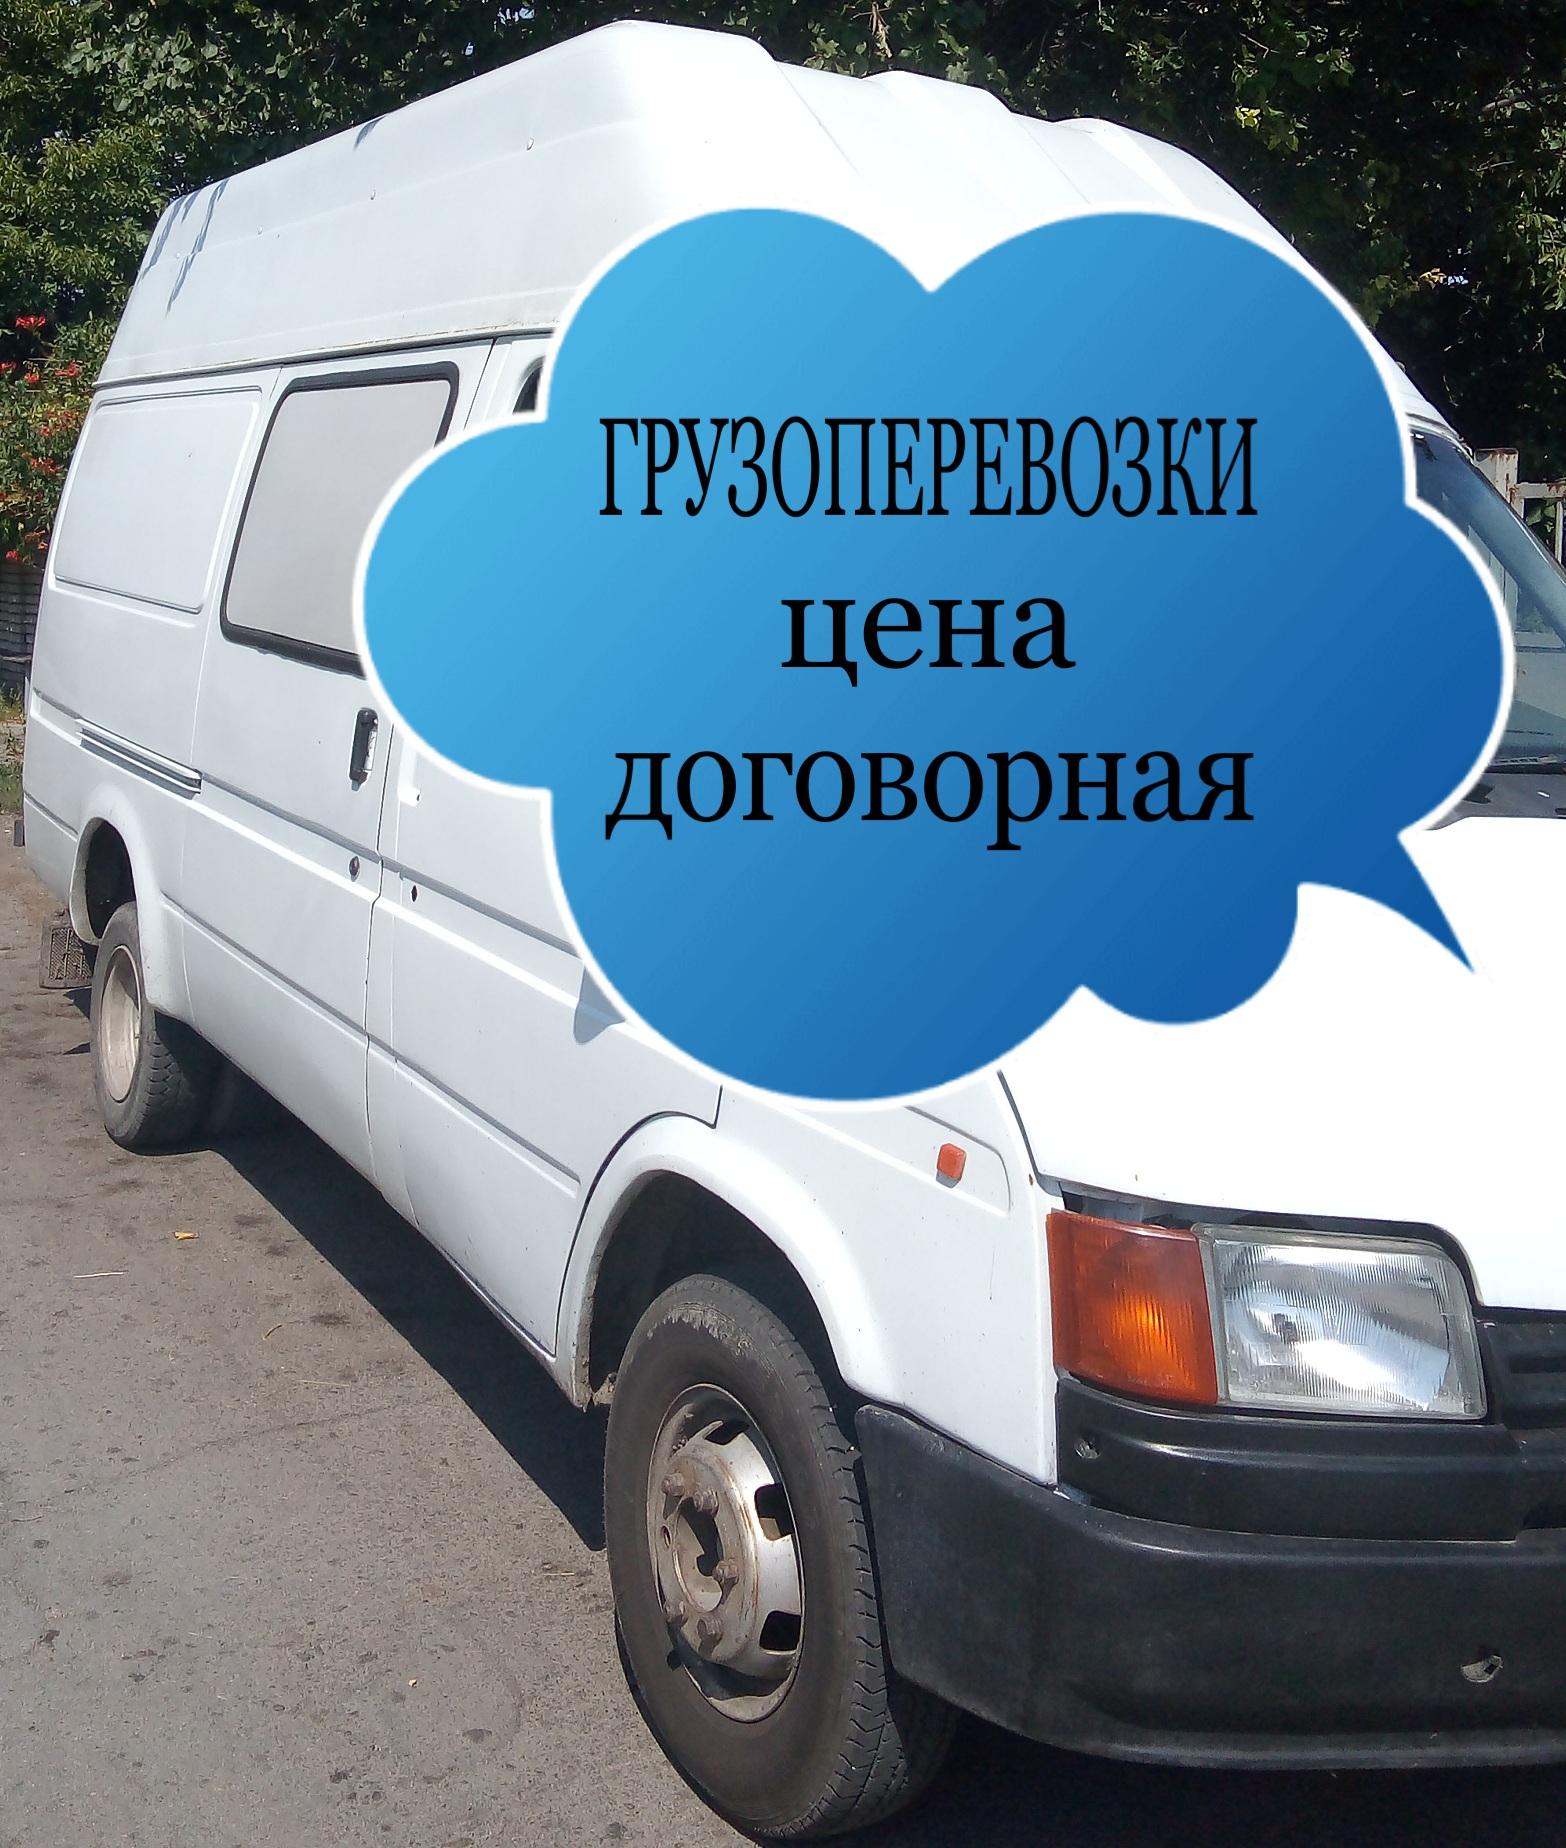 Фото Грузоперевозки.Цена договорная.  1